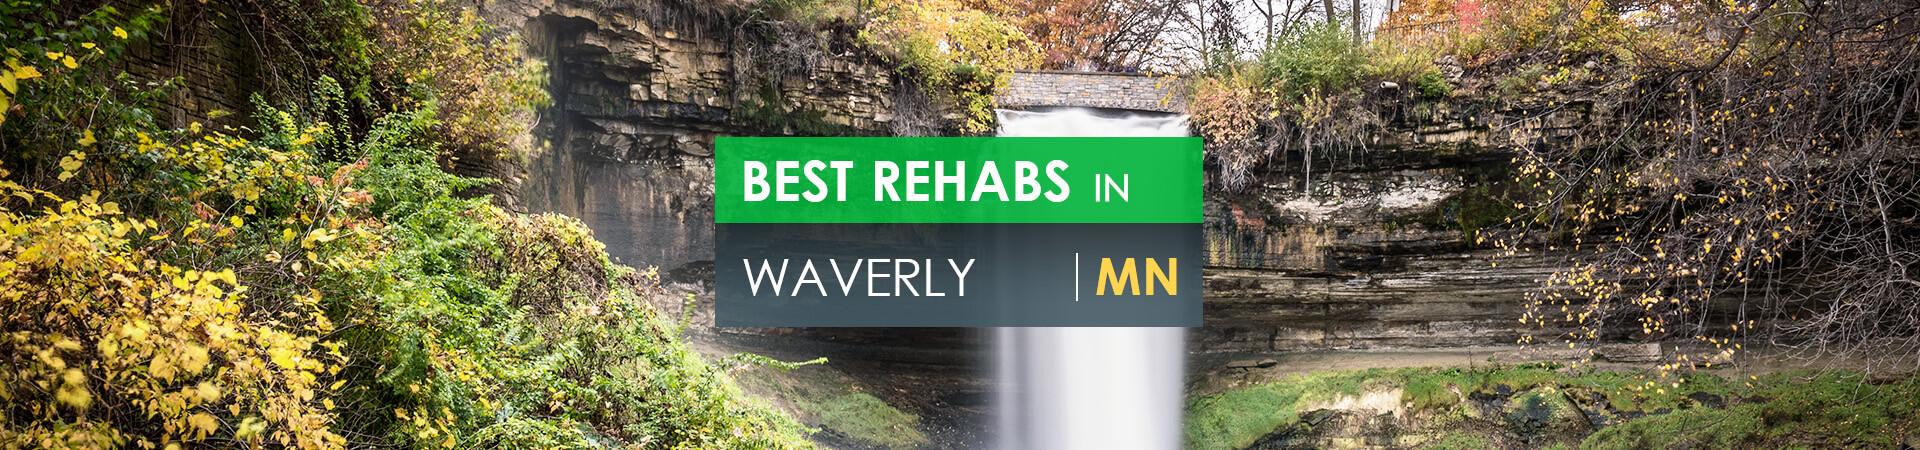 Best rehabs in Waverly, MN